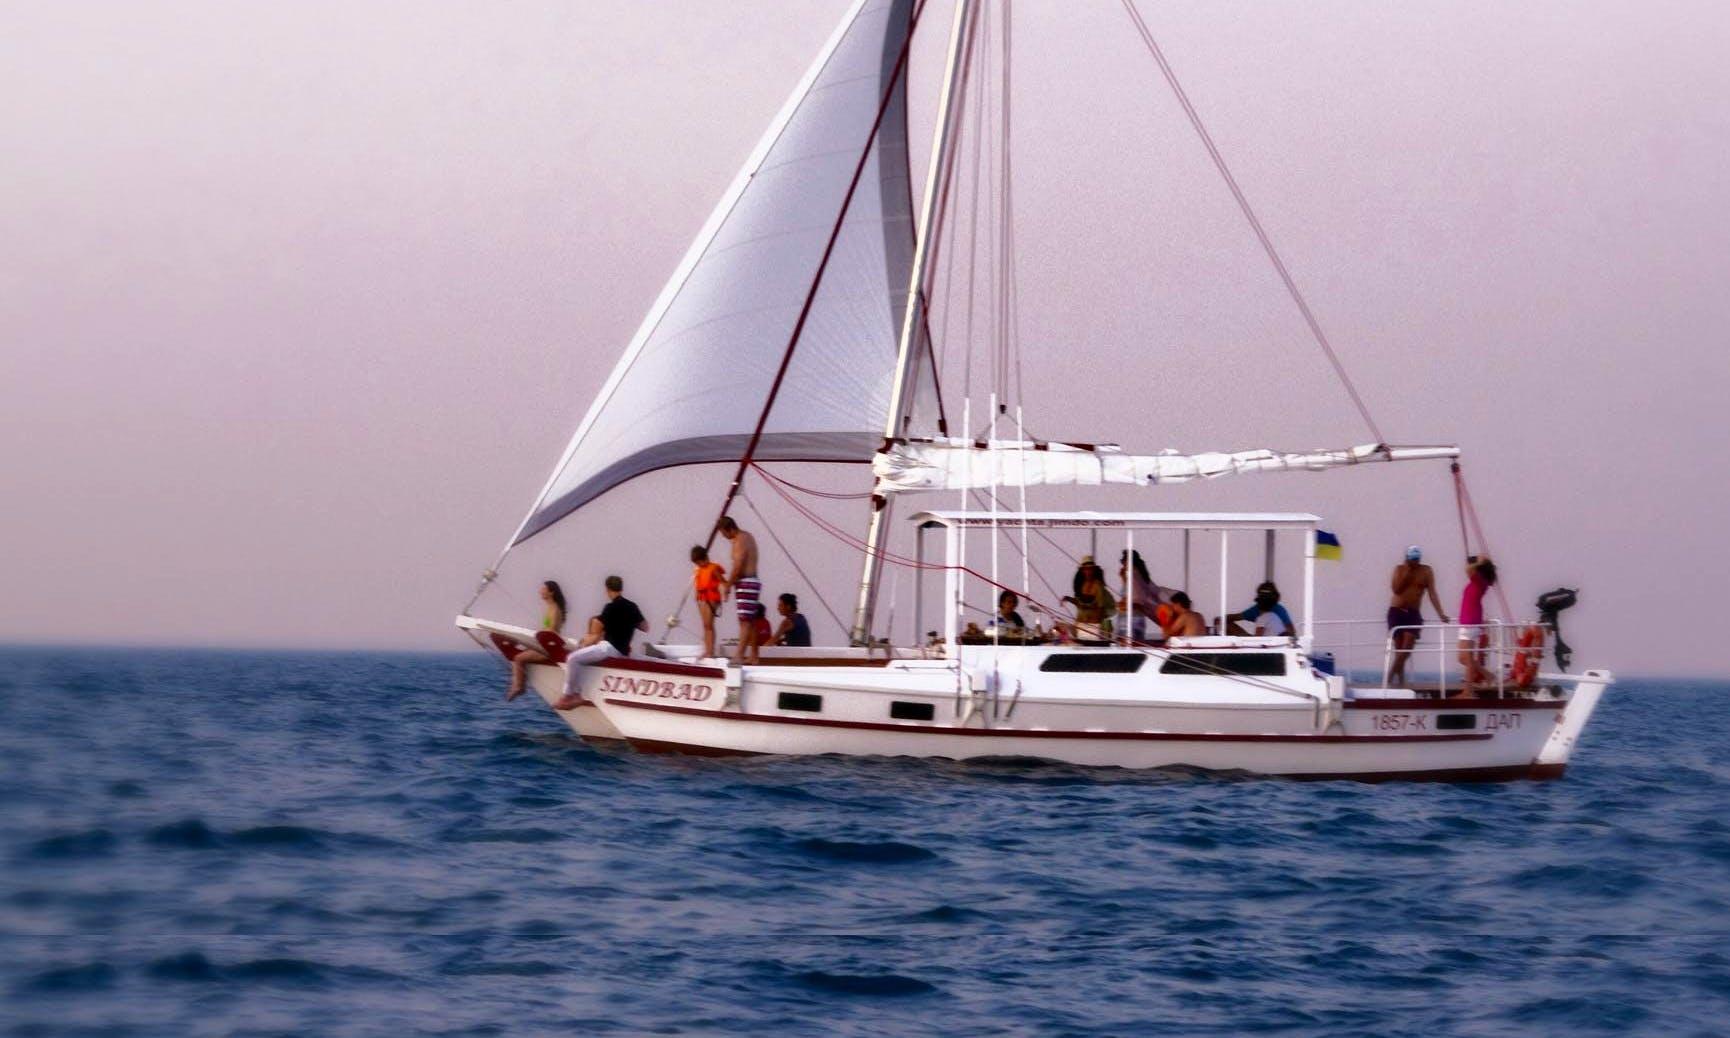 'Sinbad' Sailing Catamaran Charter in Odessa